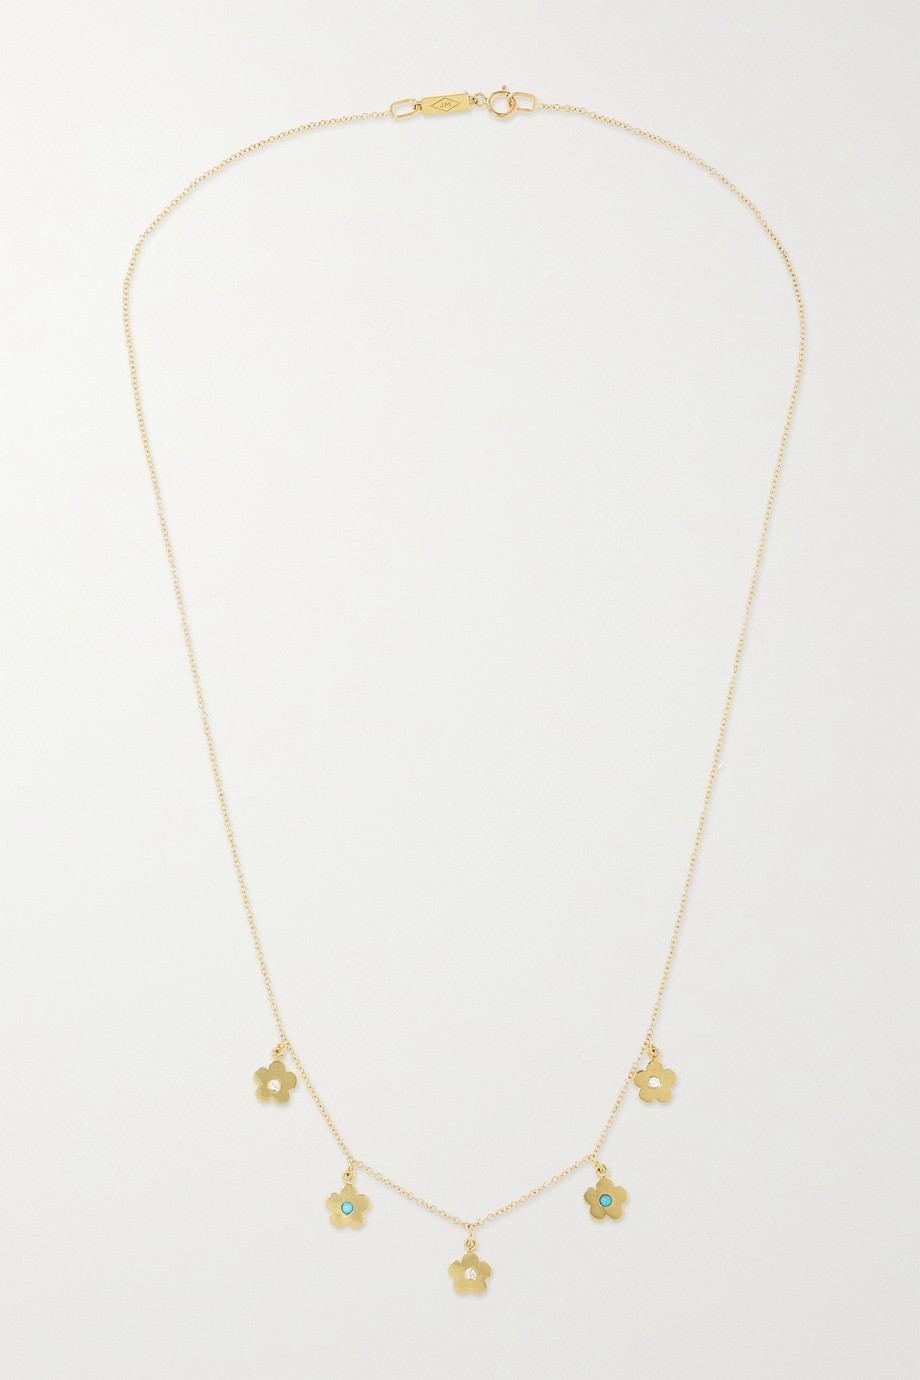 Jennifer Meyer Daisy mini 18-karat gold, turquoise and diamond necklace